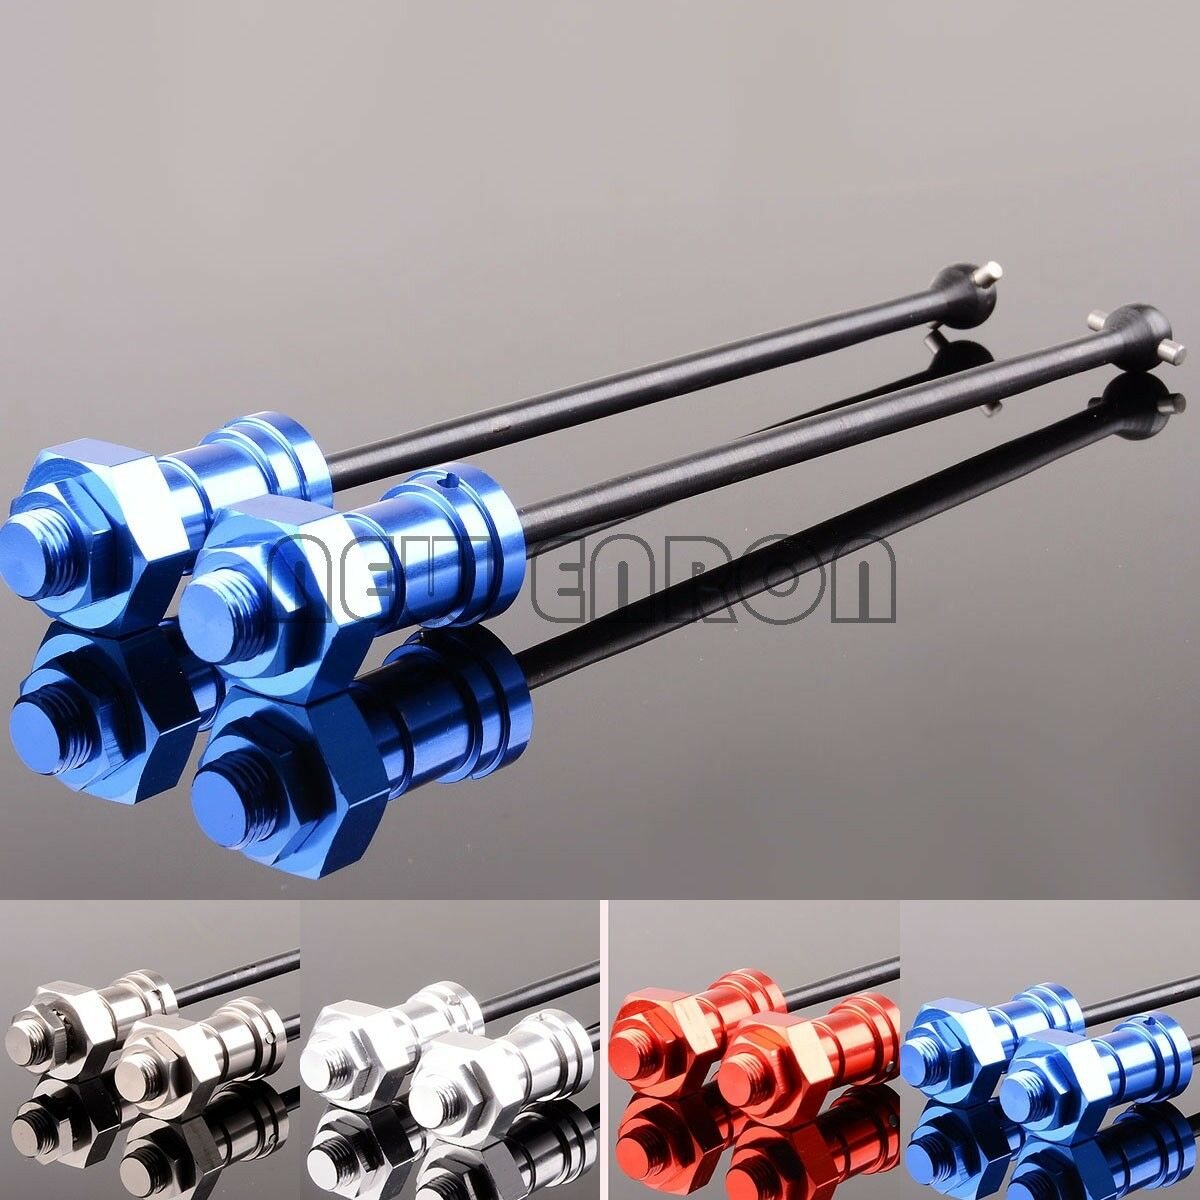 Drive shafts front Rear 8s heavy duty, stub axles for Traxxas X-Maxx 77086-4